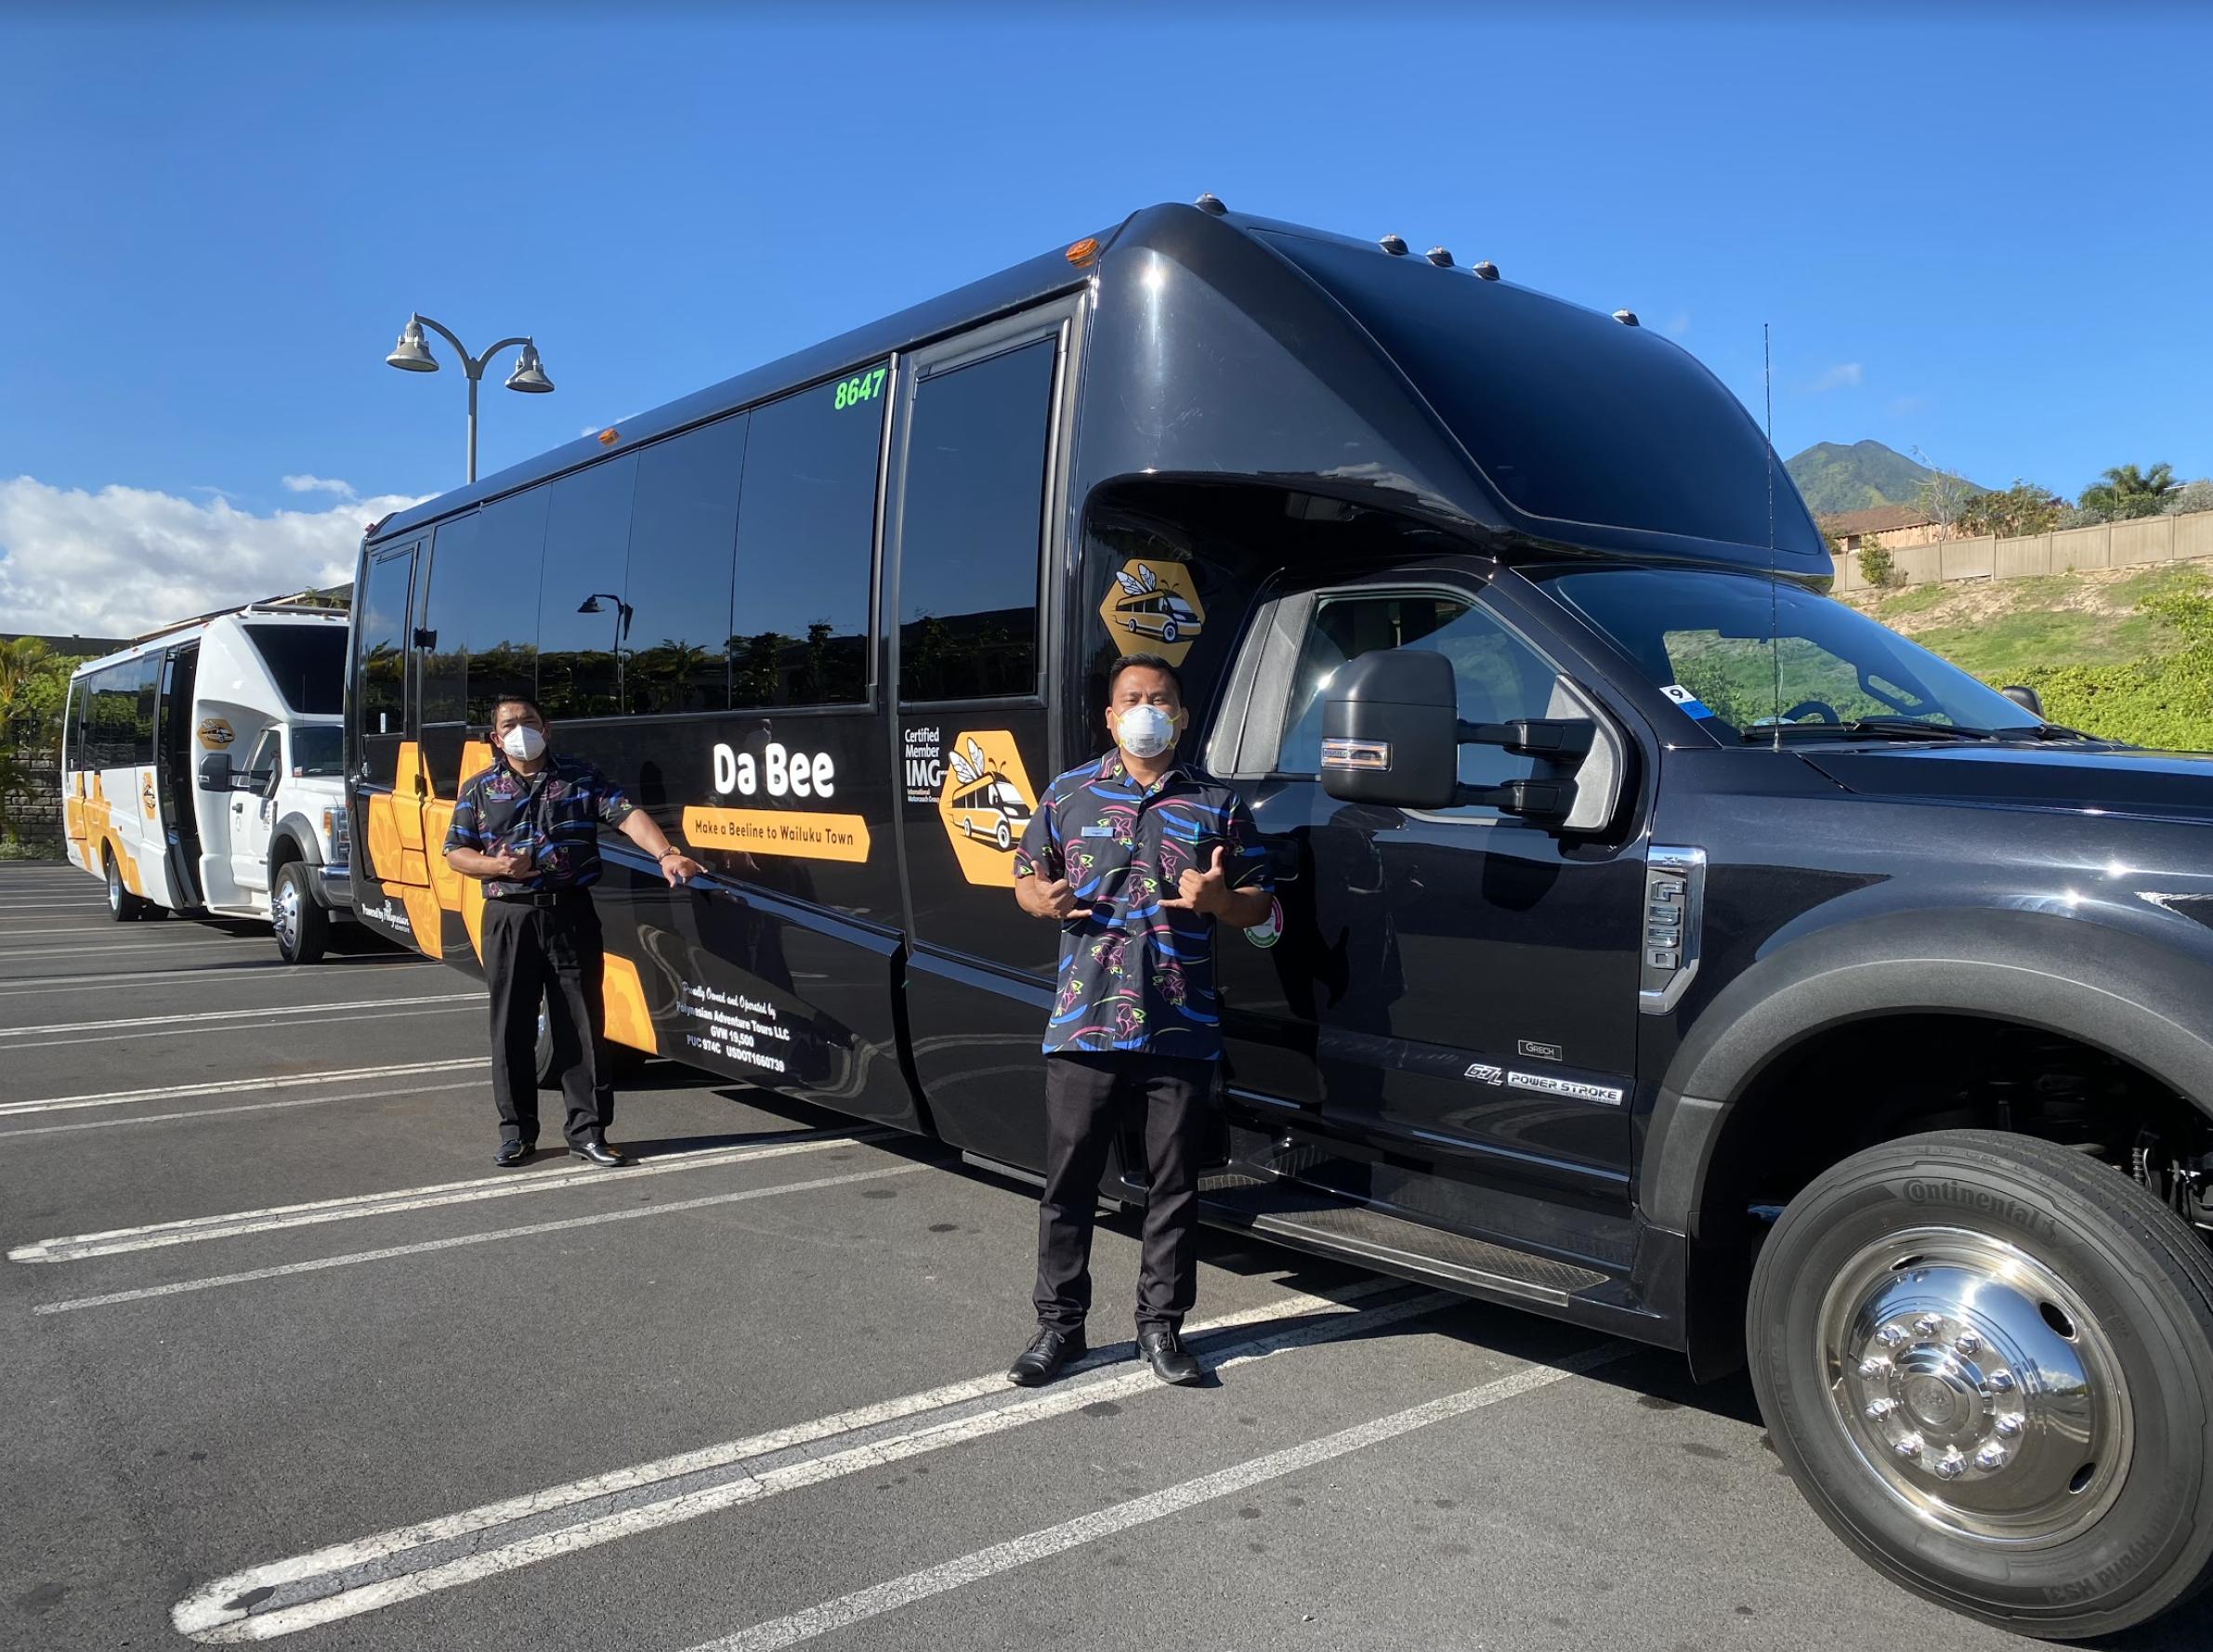 Da Bee Shuttle Route Now Includes Stop at Mā'alaea Park & Ride